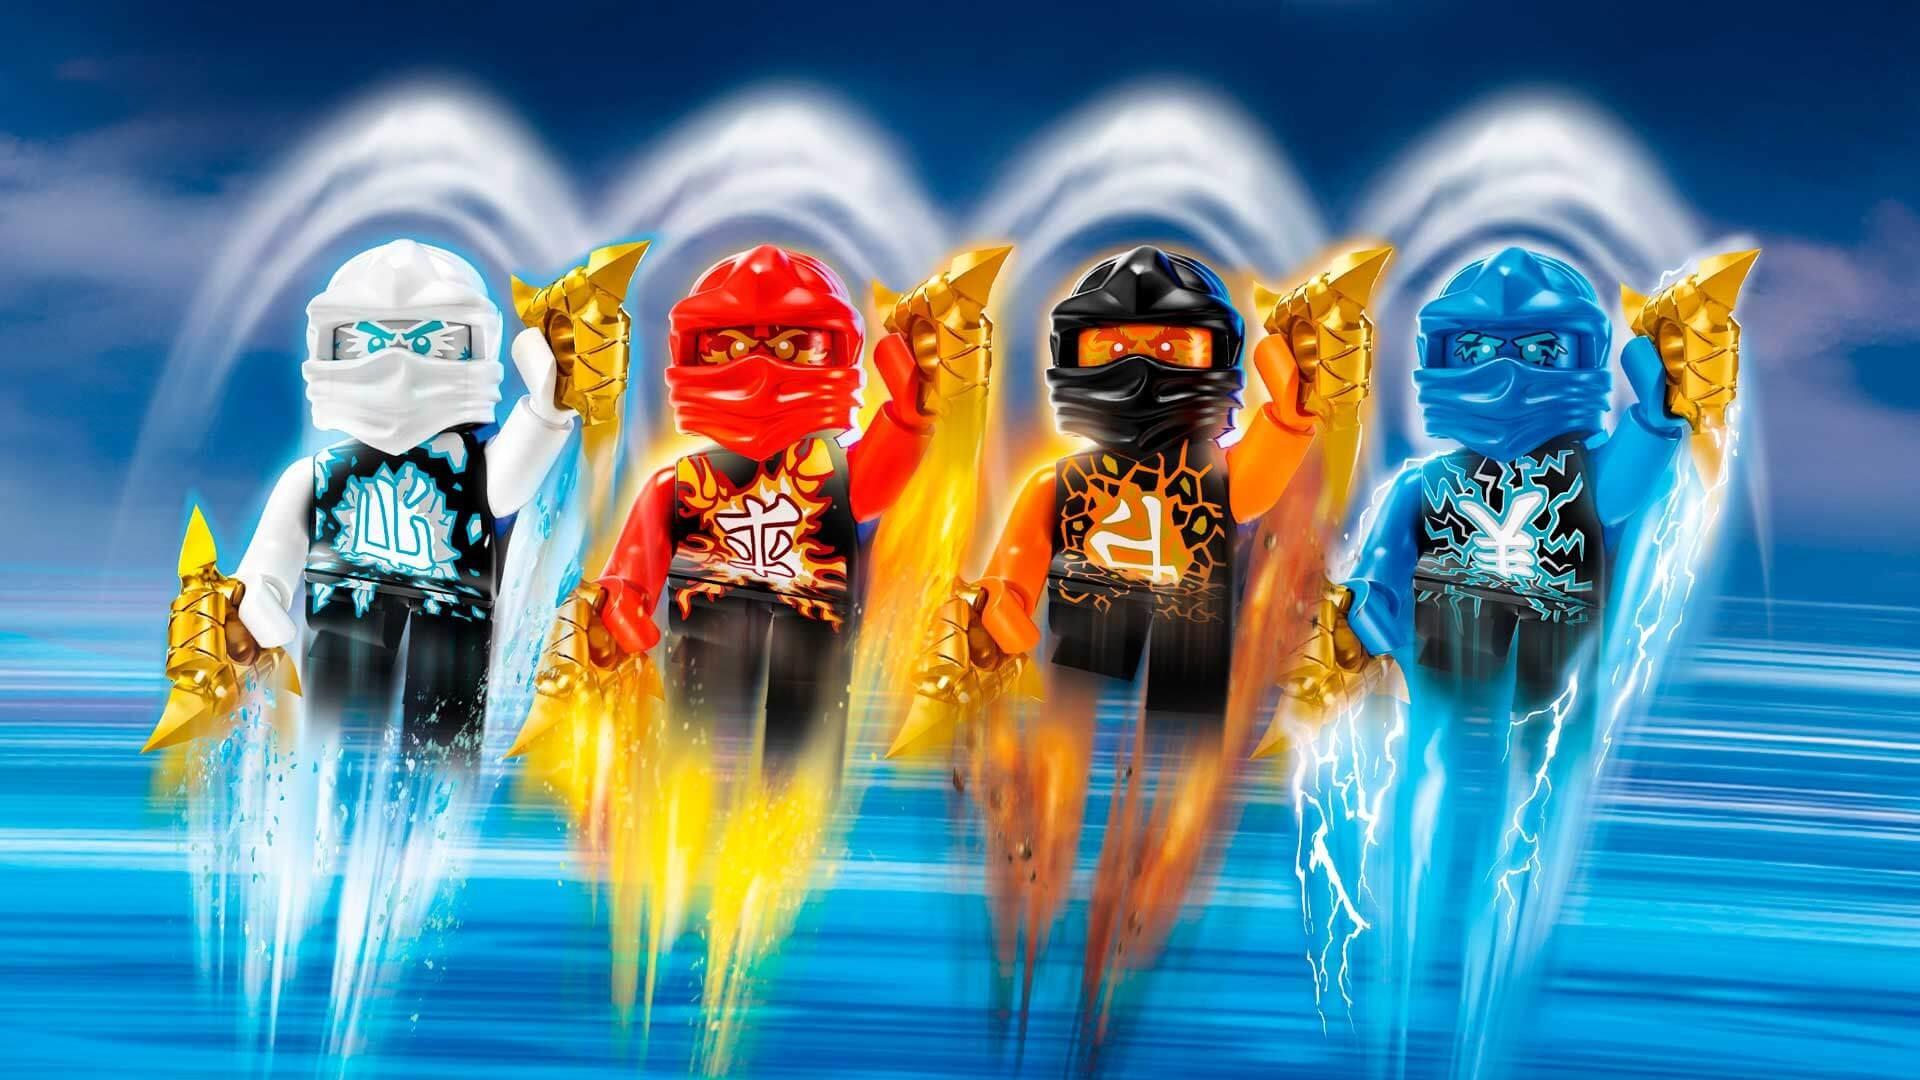 Ninjago wallpapers 73 images - Photo ninjago ...